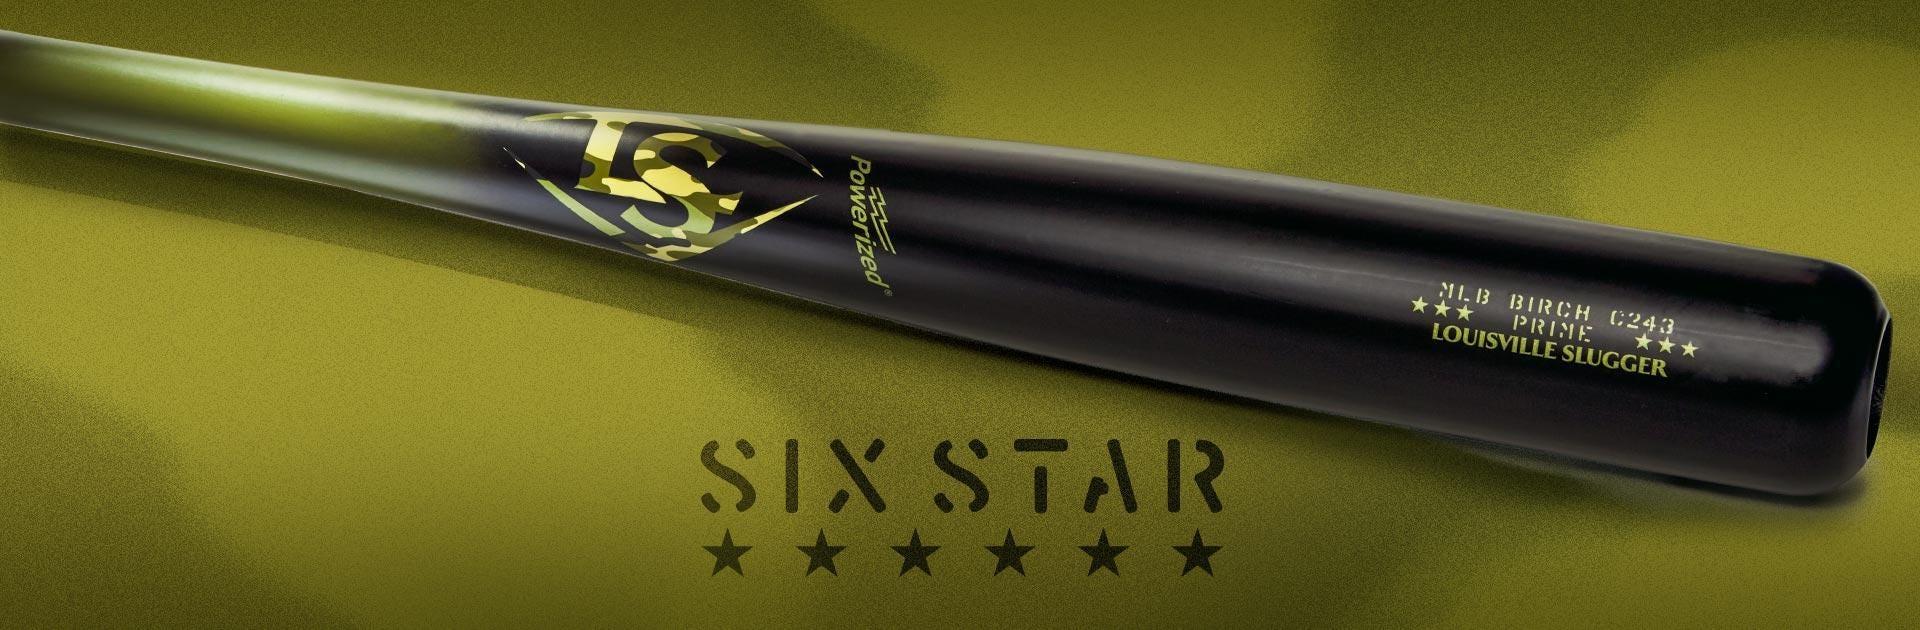 MLB Prime Limited Edition C234 Six Star Baseball Bat